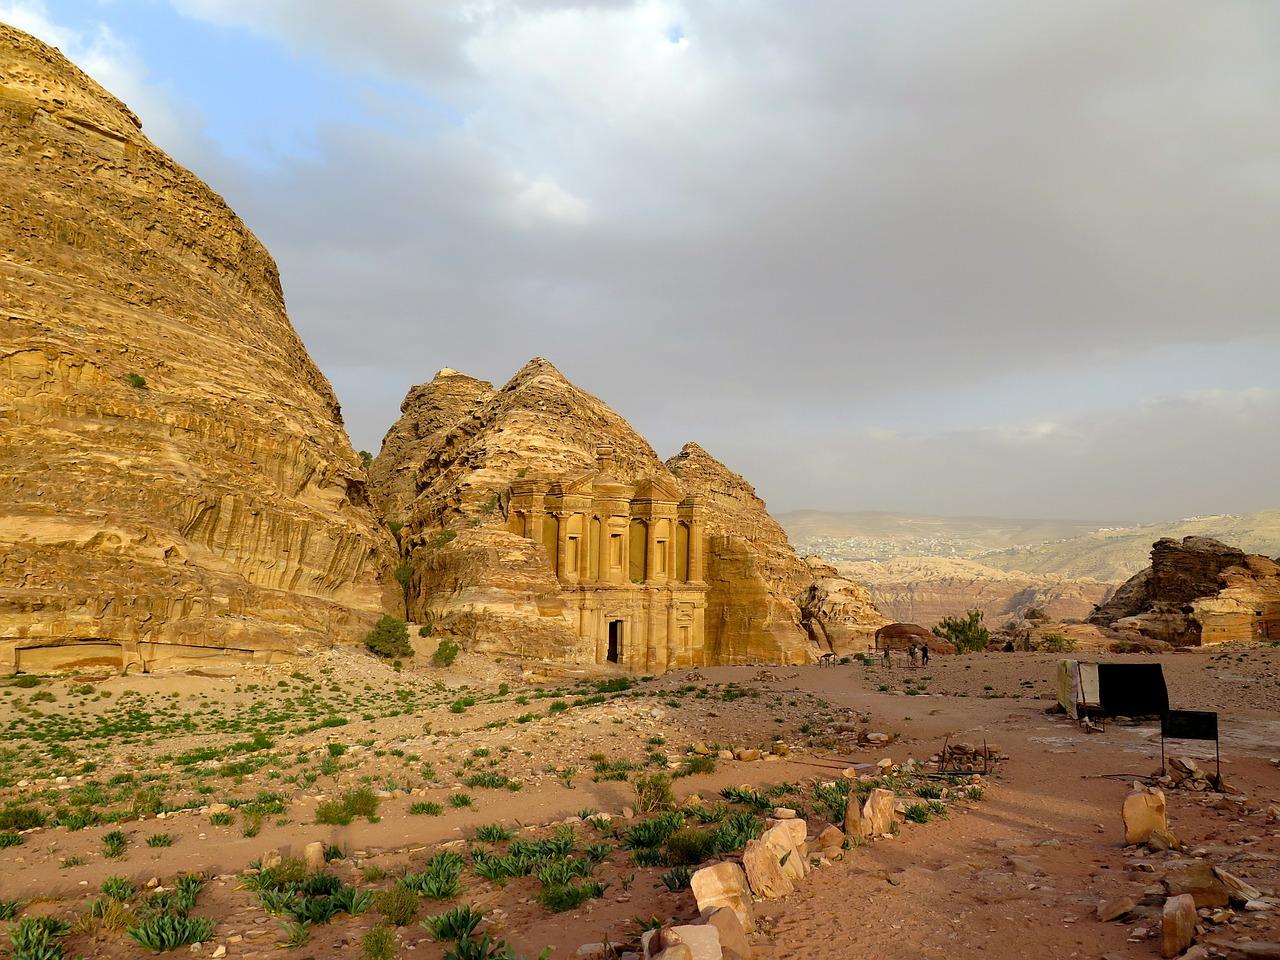 Arriving in Petra